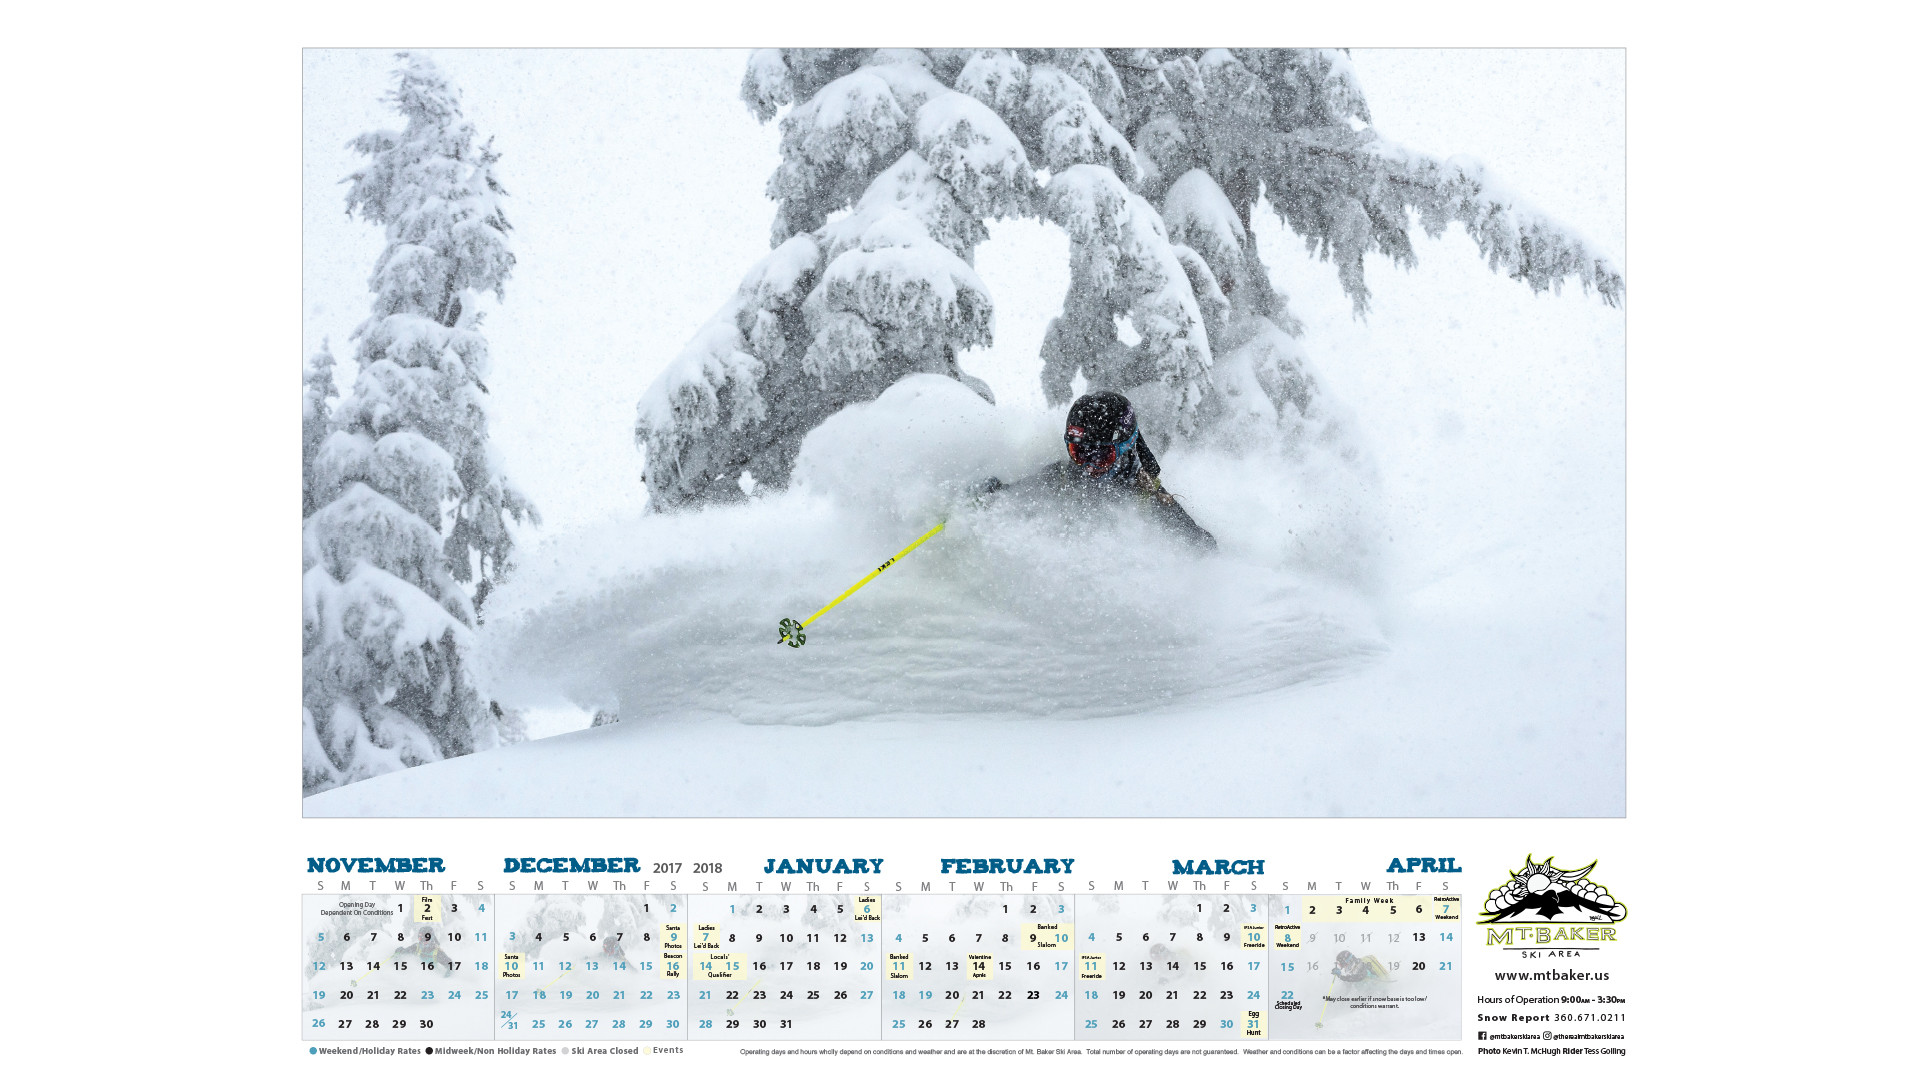 Calendar Wallpaper Live Pc : Desktop wallpaper calendar  images